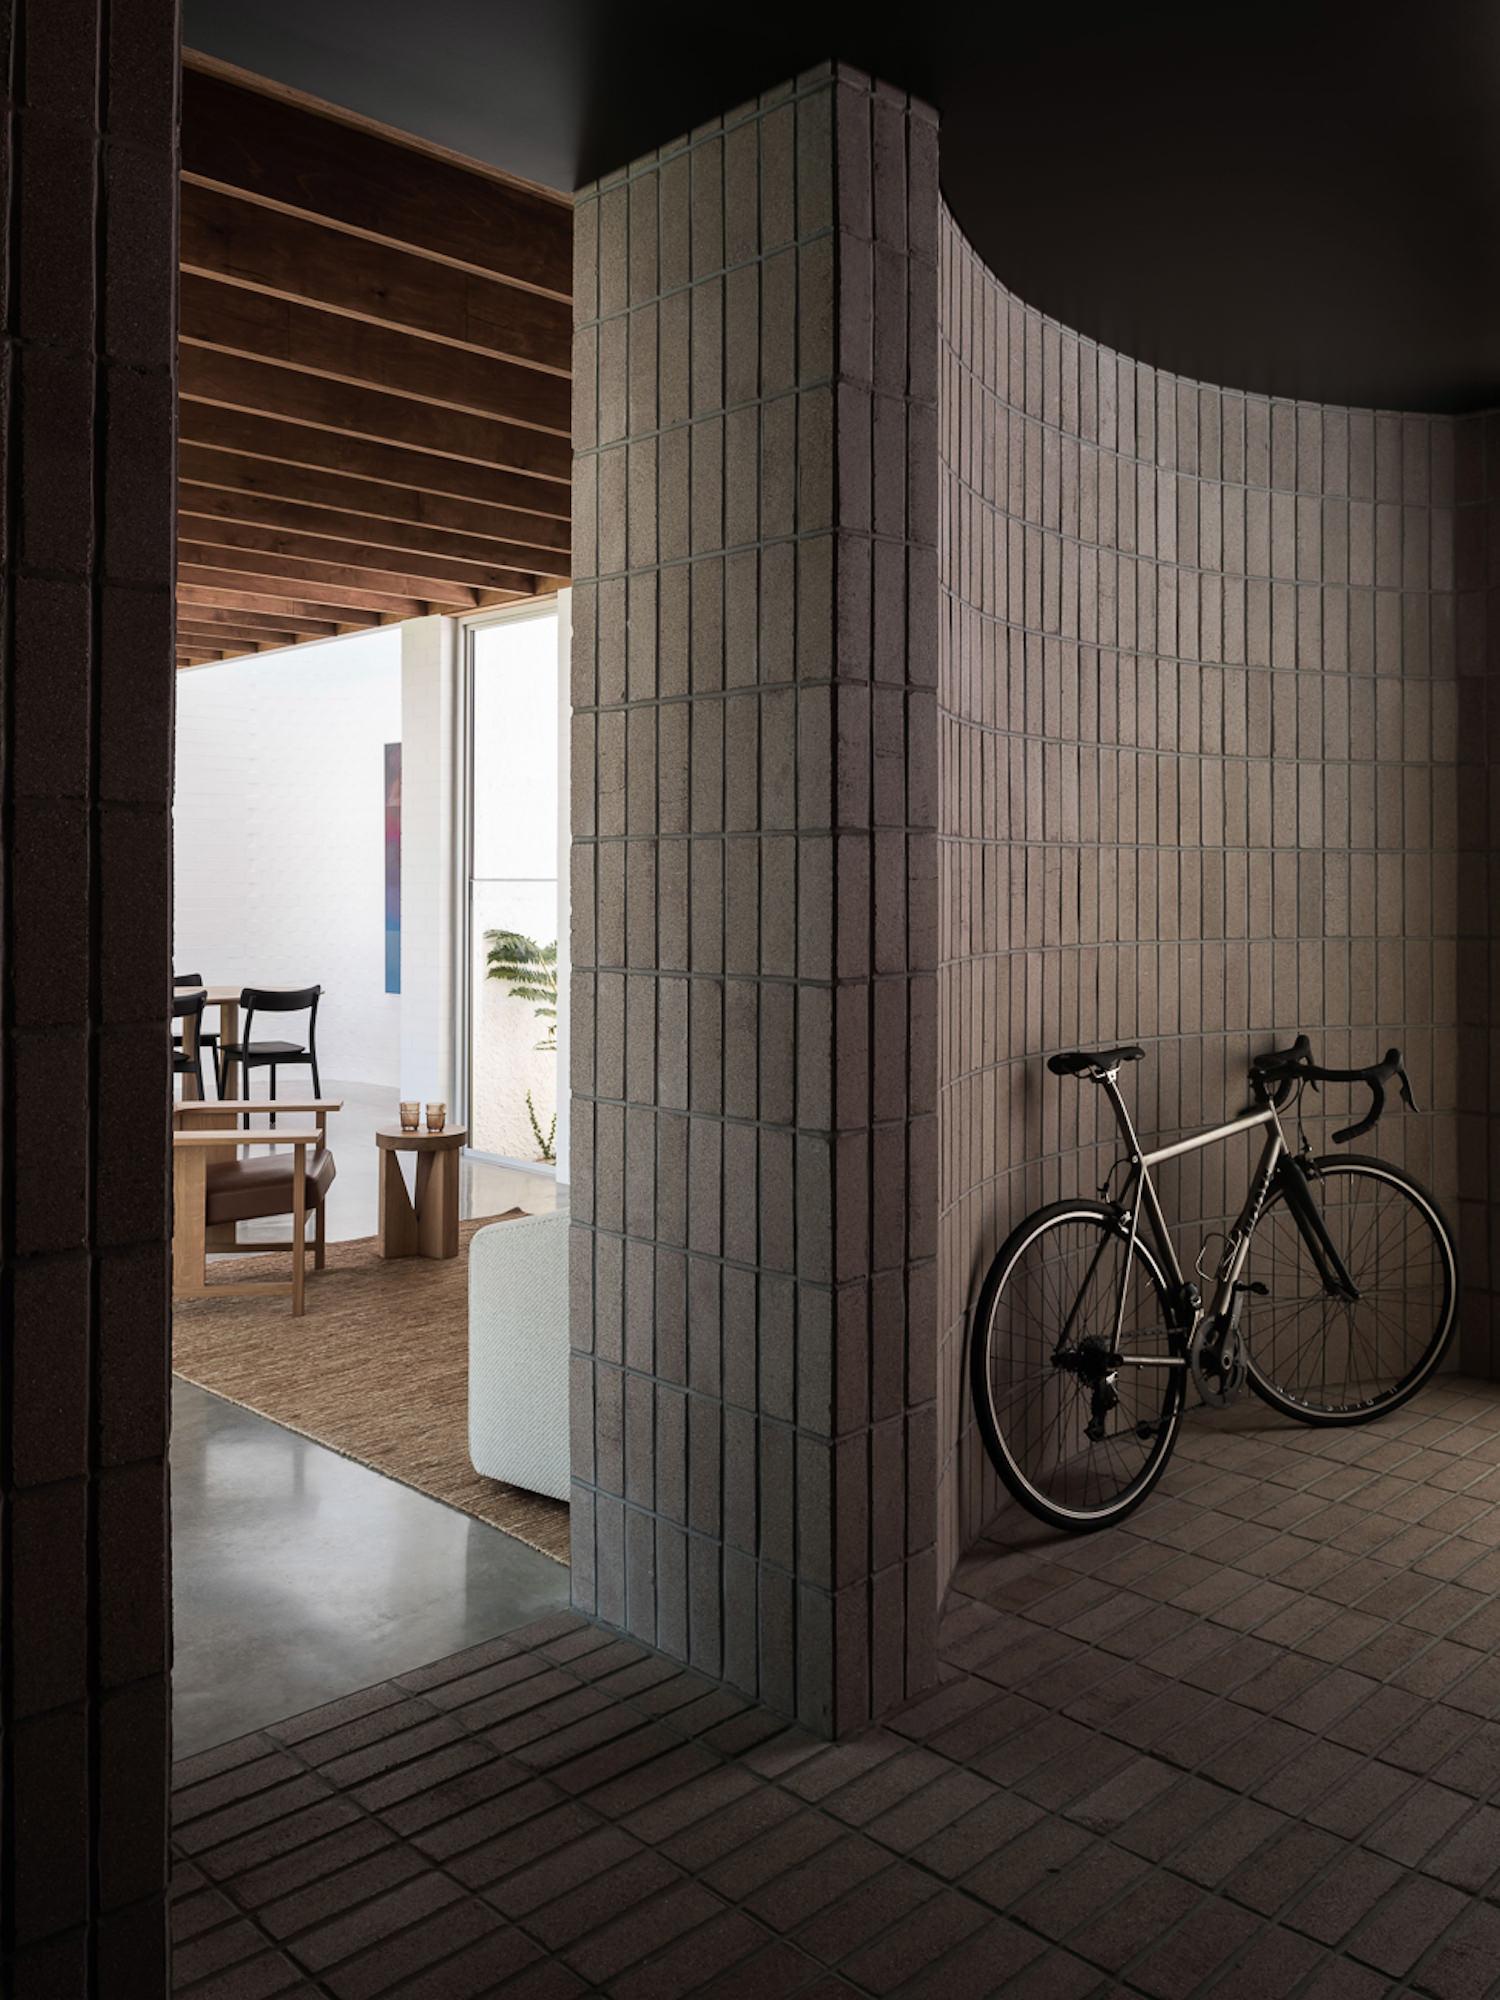 Nic Brunsdon East Fremantle House Australian Architecture Photo Dion Robeson Yellowtrace 07